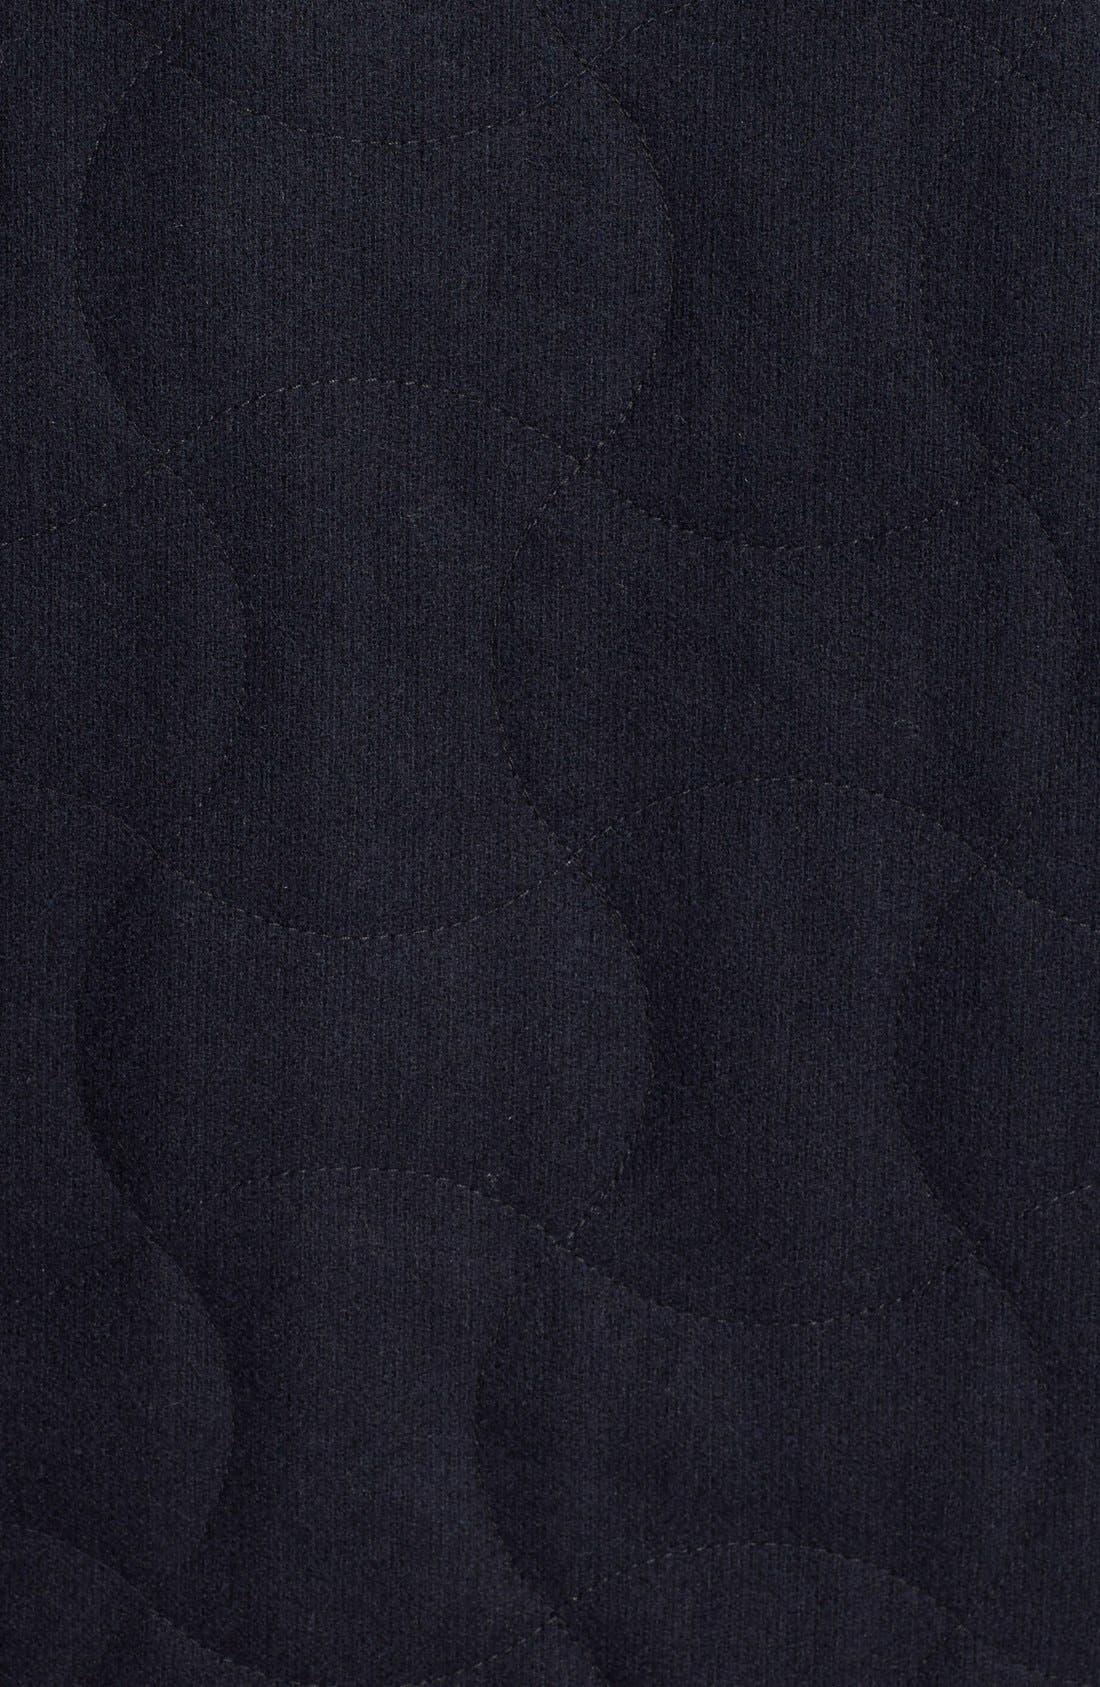 Alternate Image 3  - Spiewak 'Tarmak' Quilted Wool Blend Parka